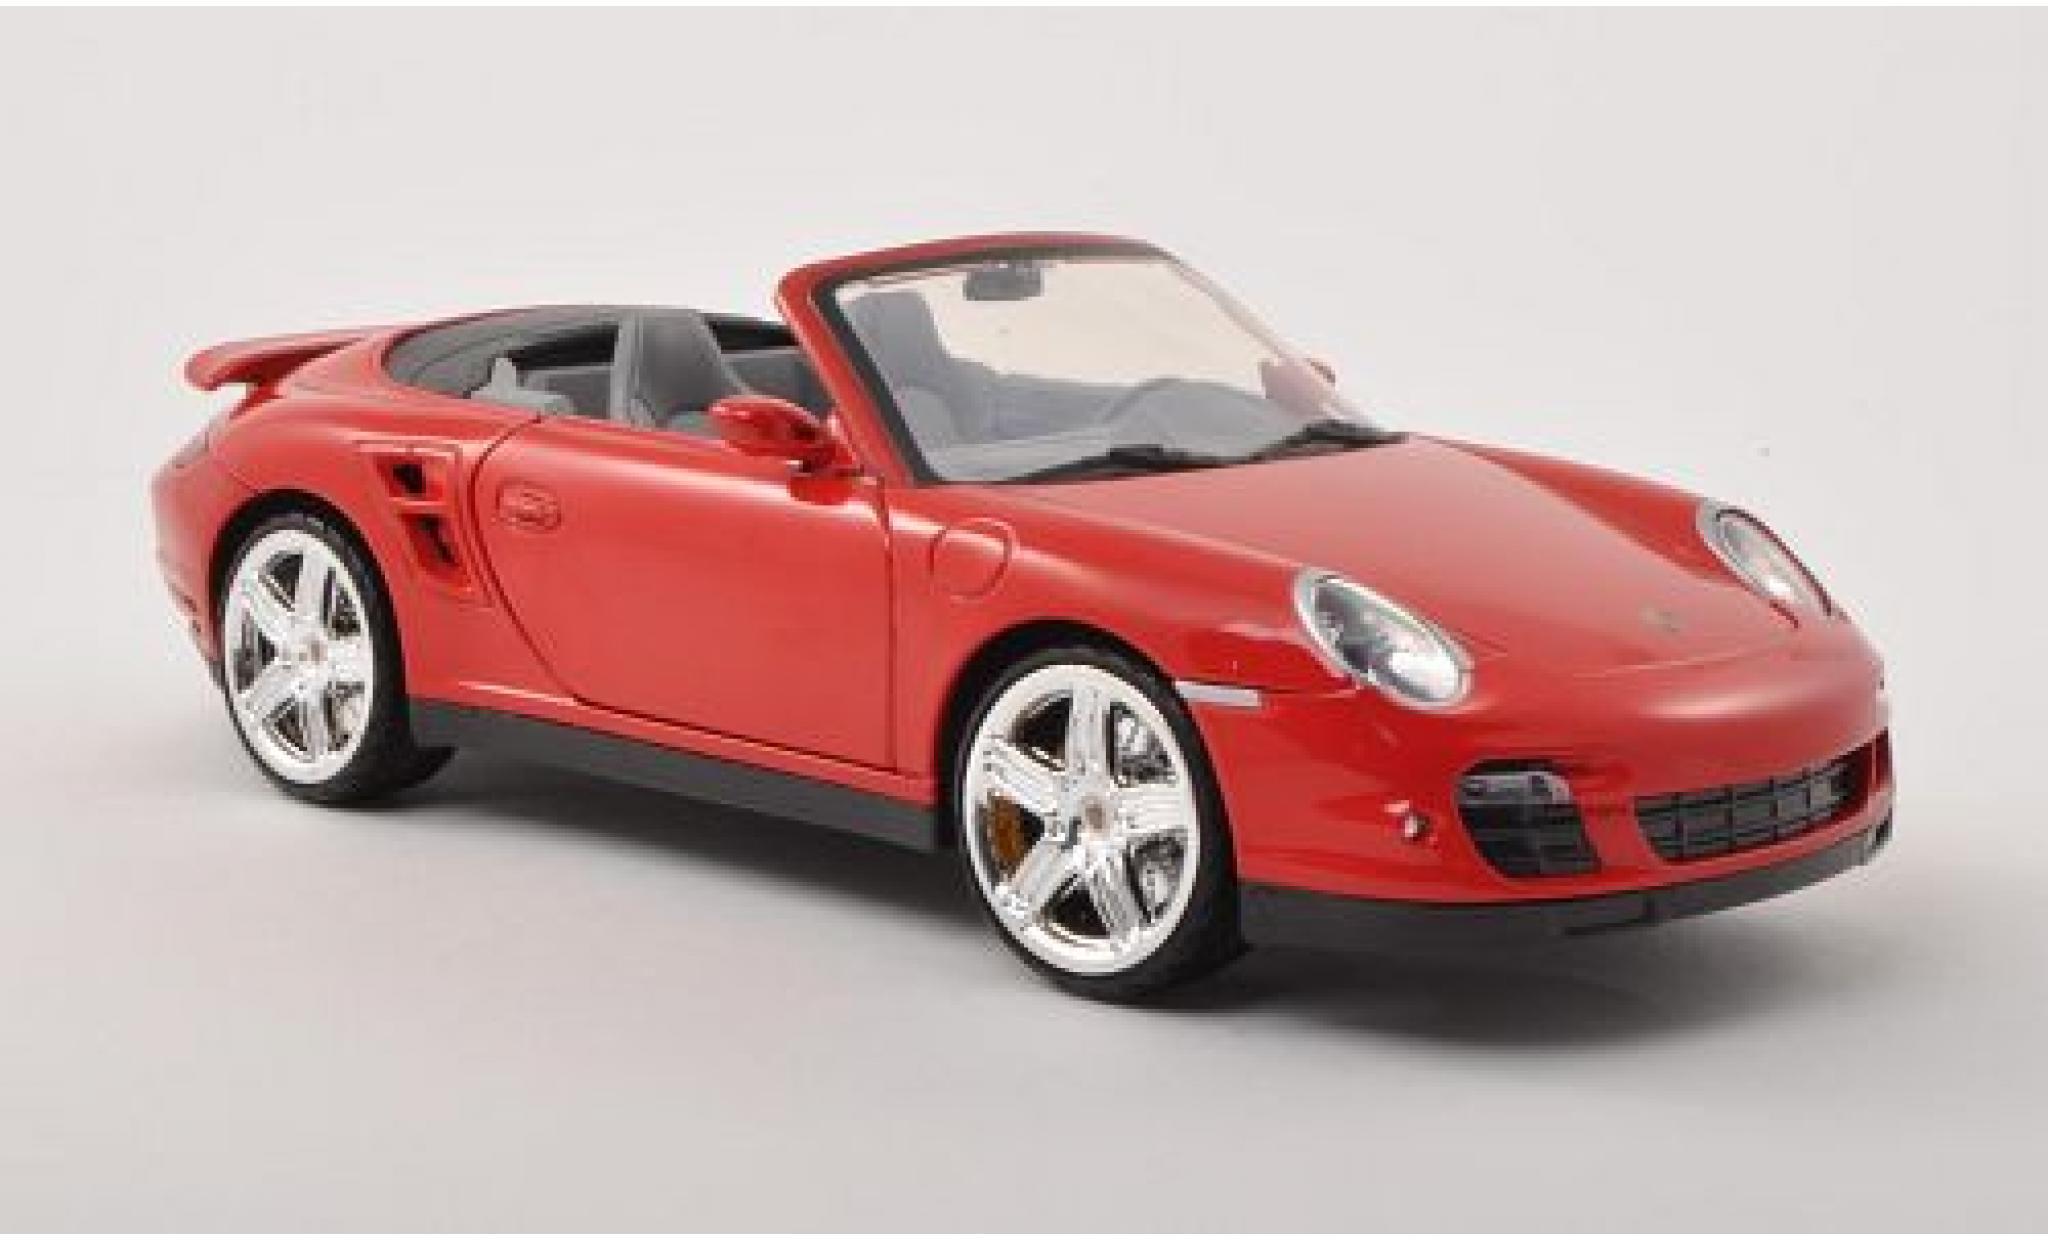 Porsche 997 Turbo 1/18 Motormax 911  Cabriolet red